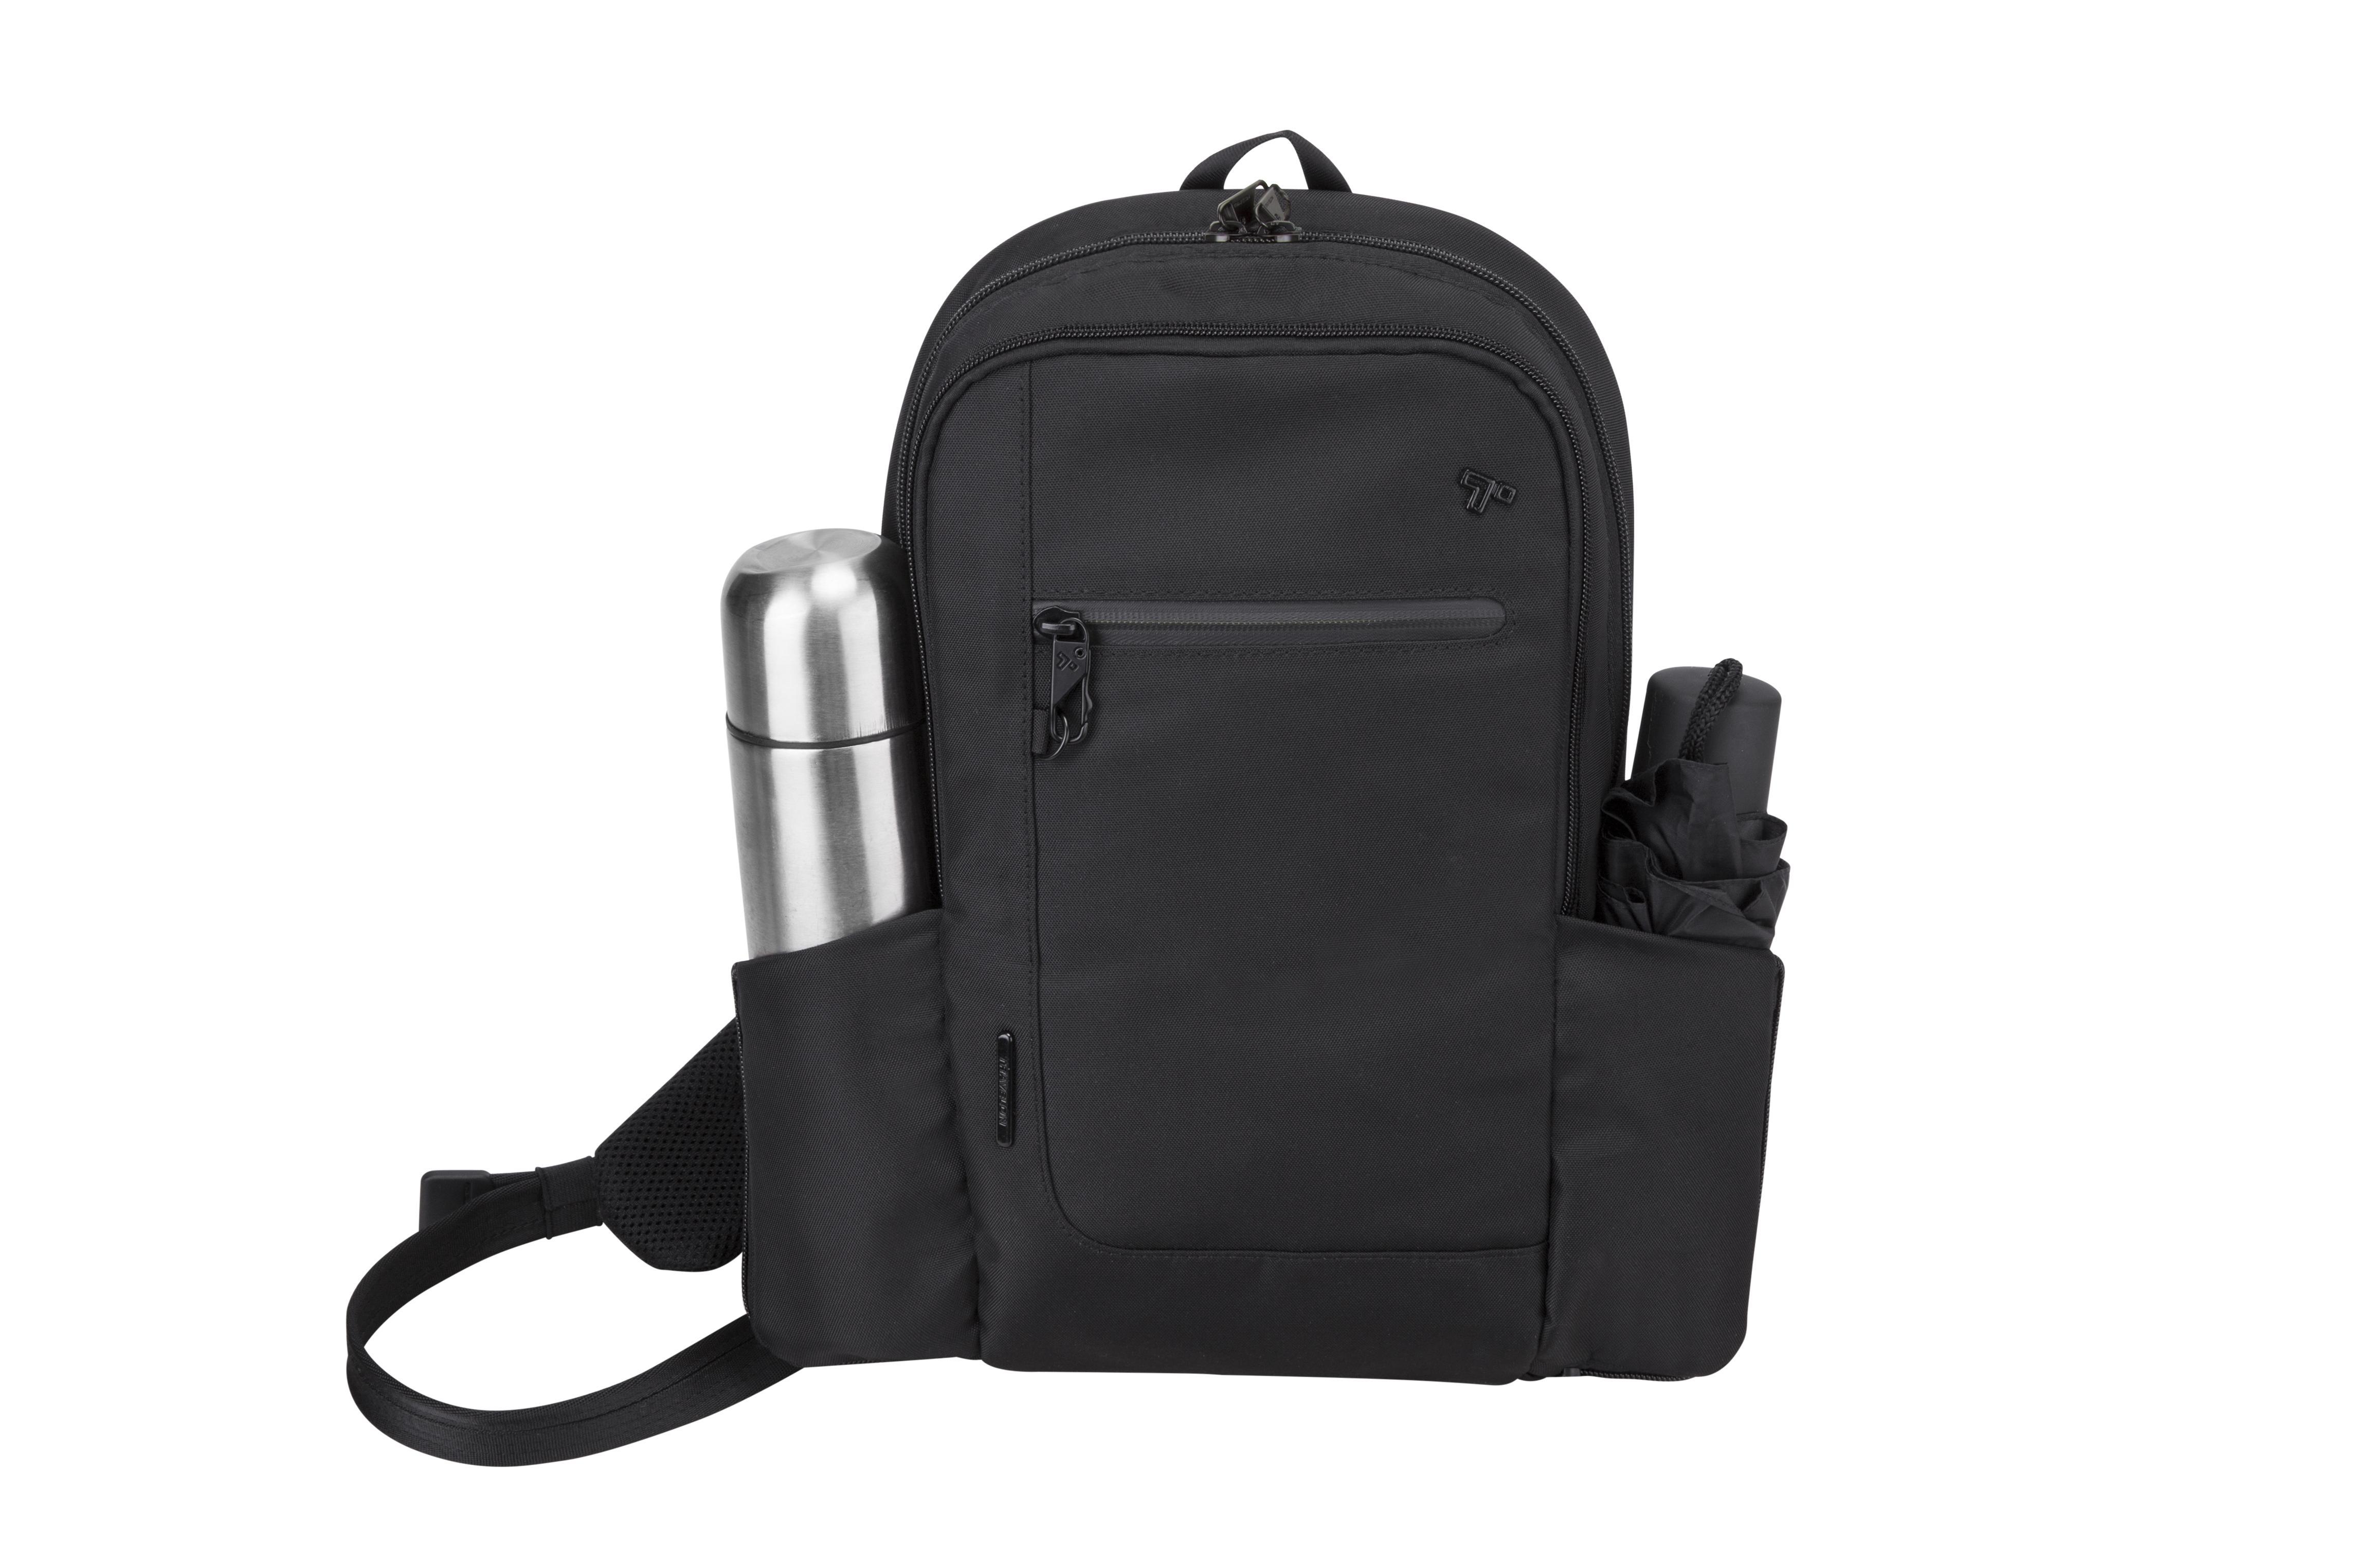 New-Travelon-Men-039-s-Anti-Theft-Urban-Sling-Bag